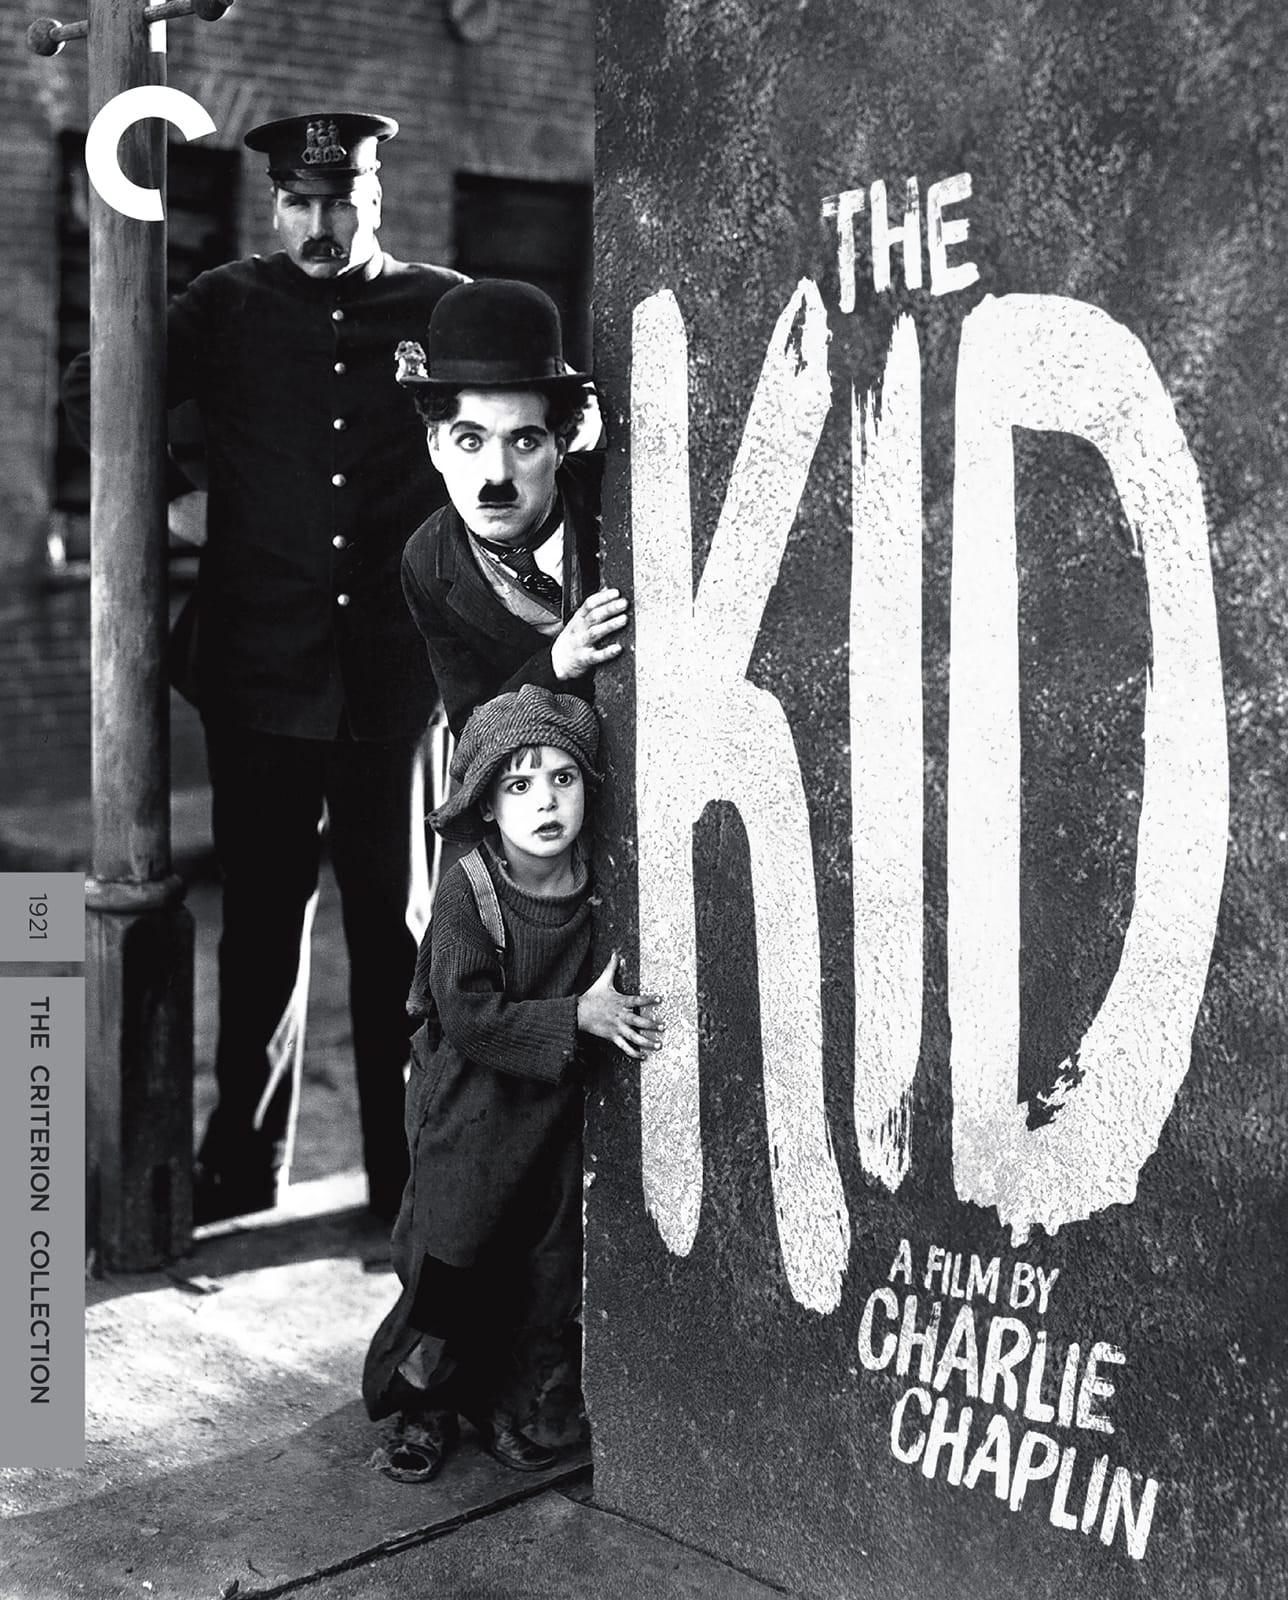 The kid 4.jpg